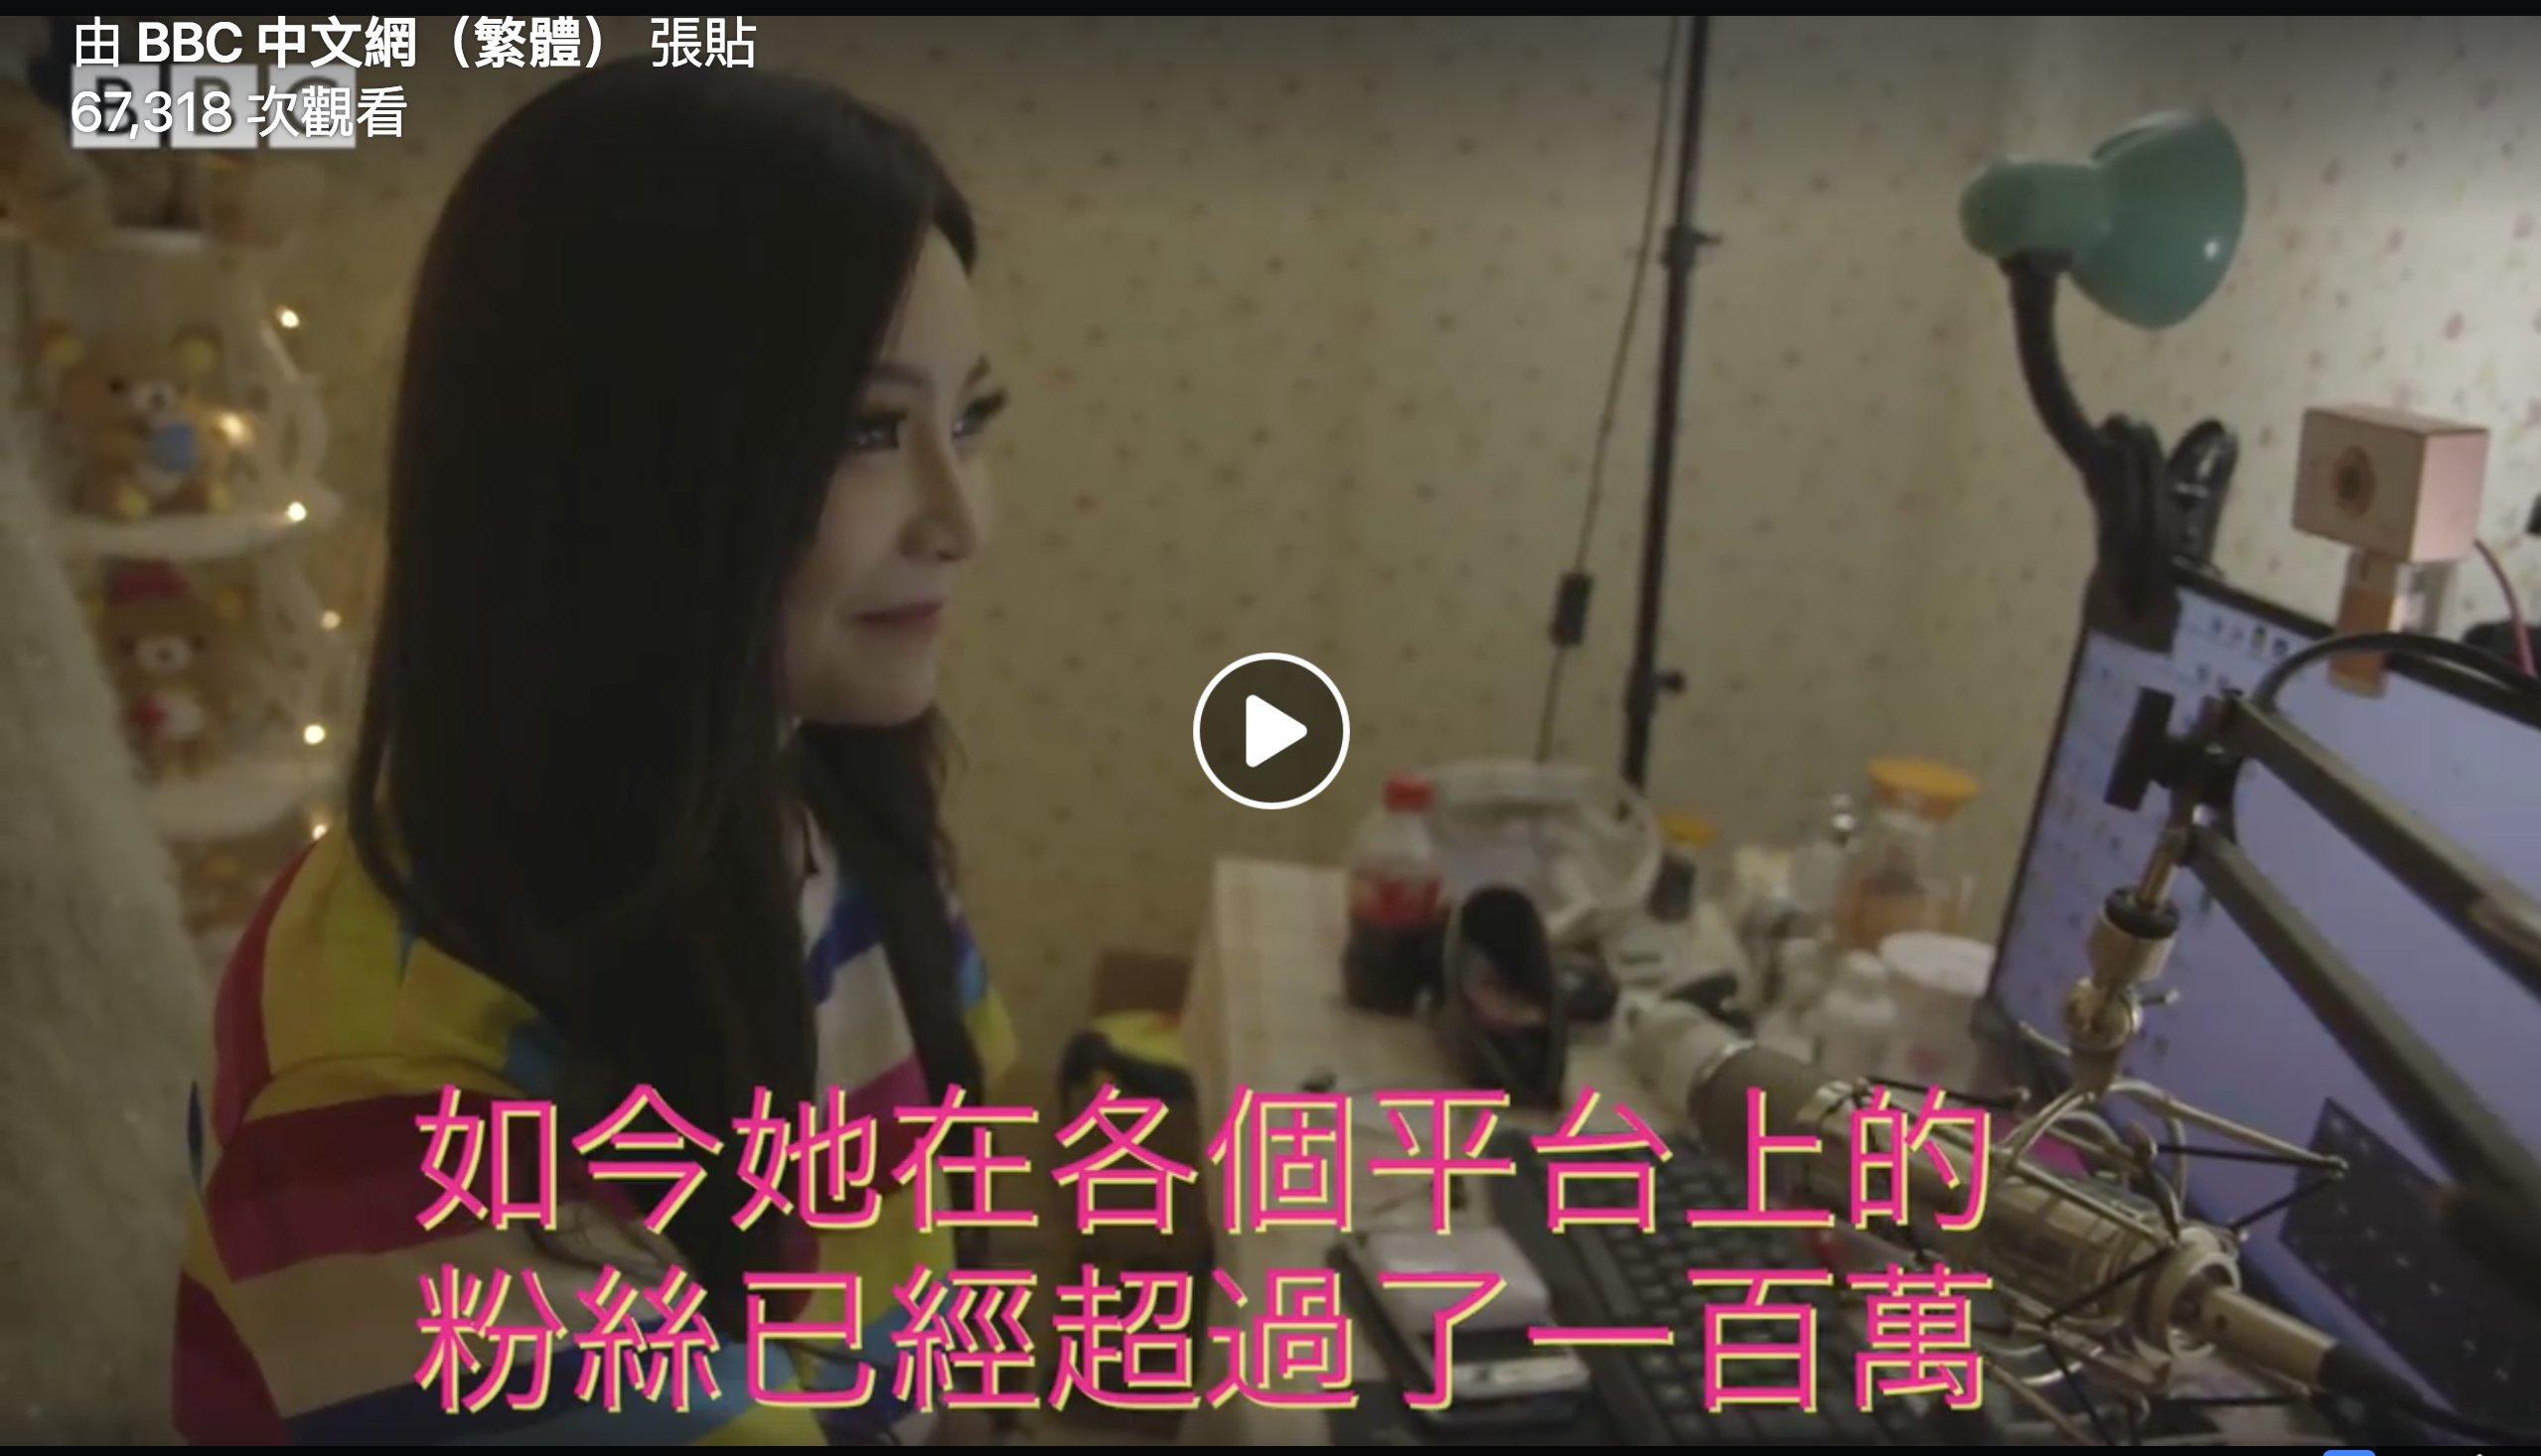 screen shot 2018 10 25 at 3 31 17 pm.png?resize=300,169 - 直播真的那麼好做?BBC記錄中國網絡女主播背後的辛酸故事「直播主的人生」!